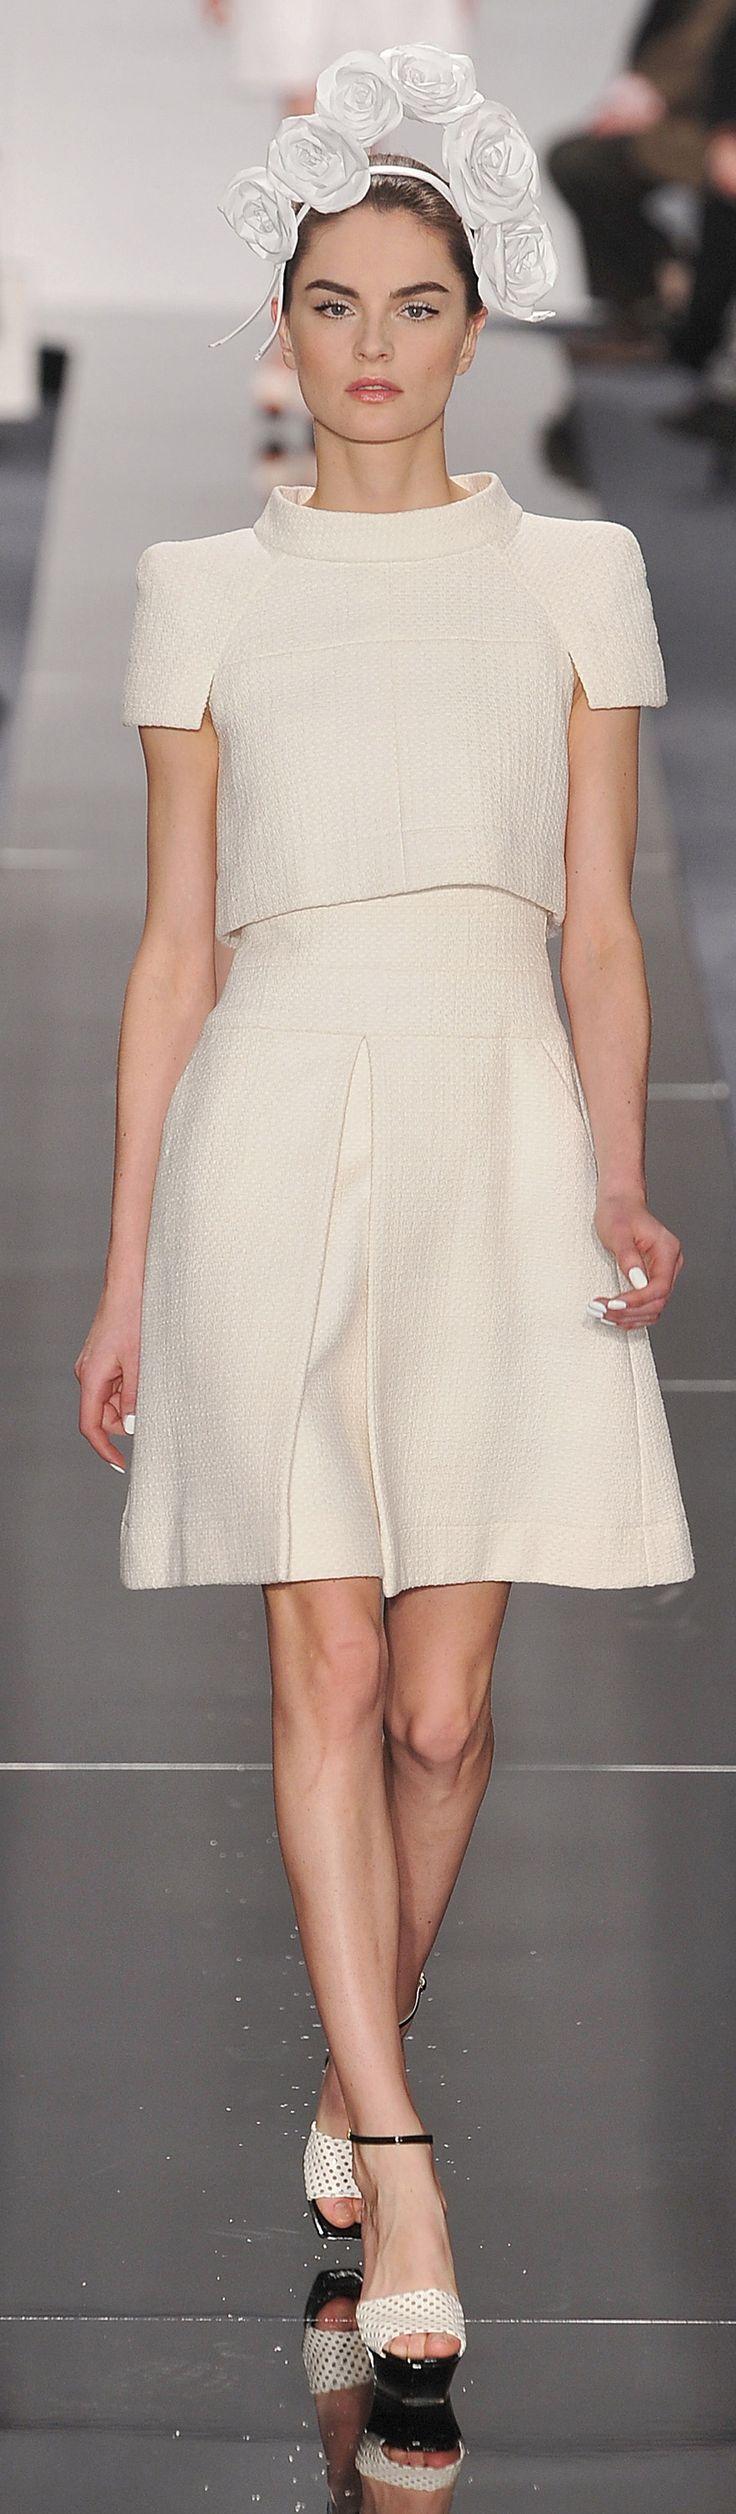 Chanel ~ Haute Couture Ivory Cape Dress Midi Dress